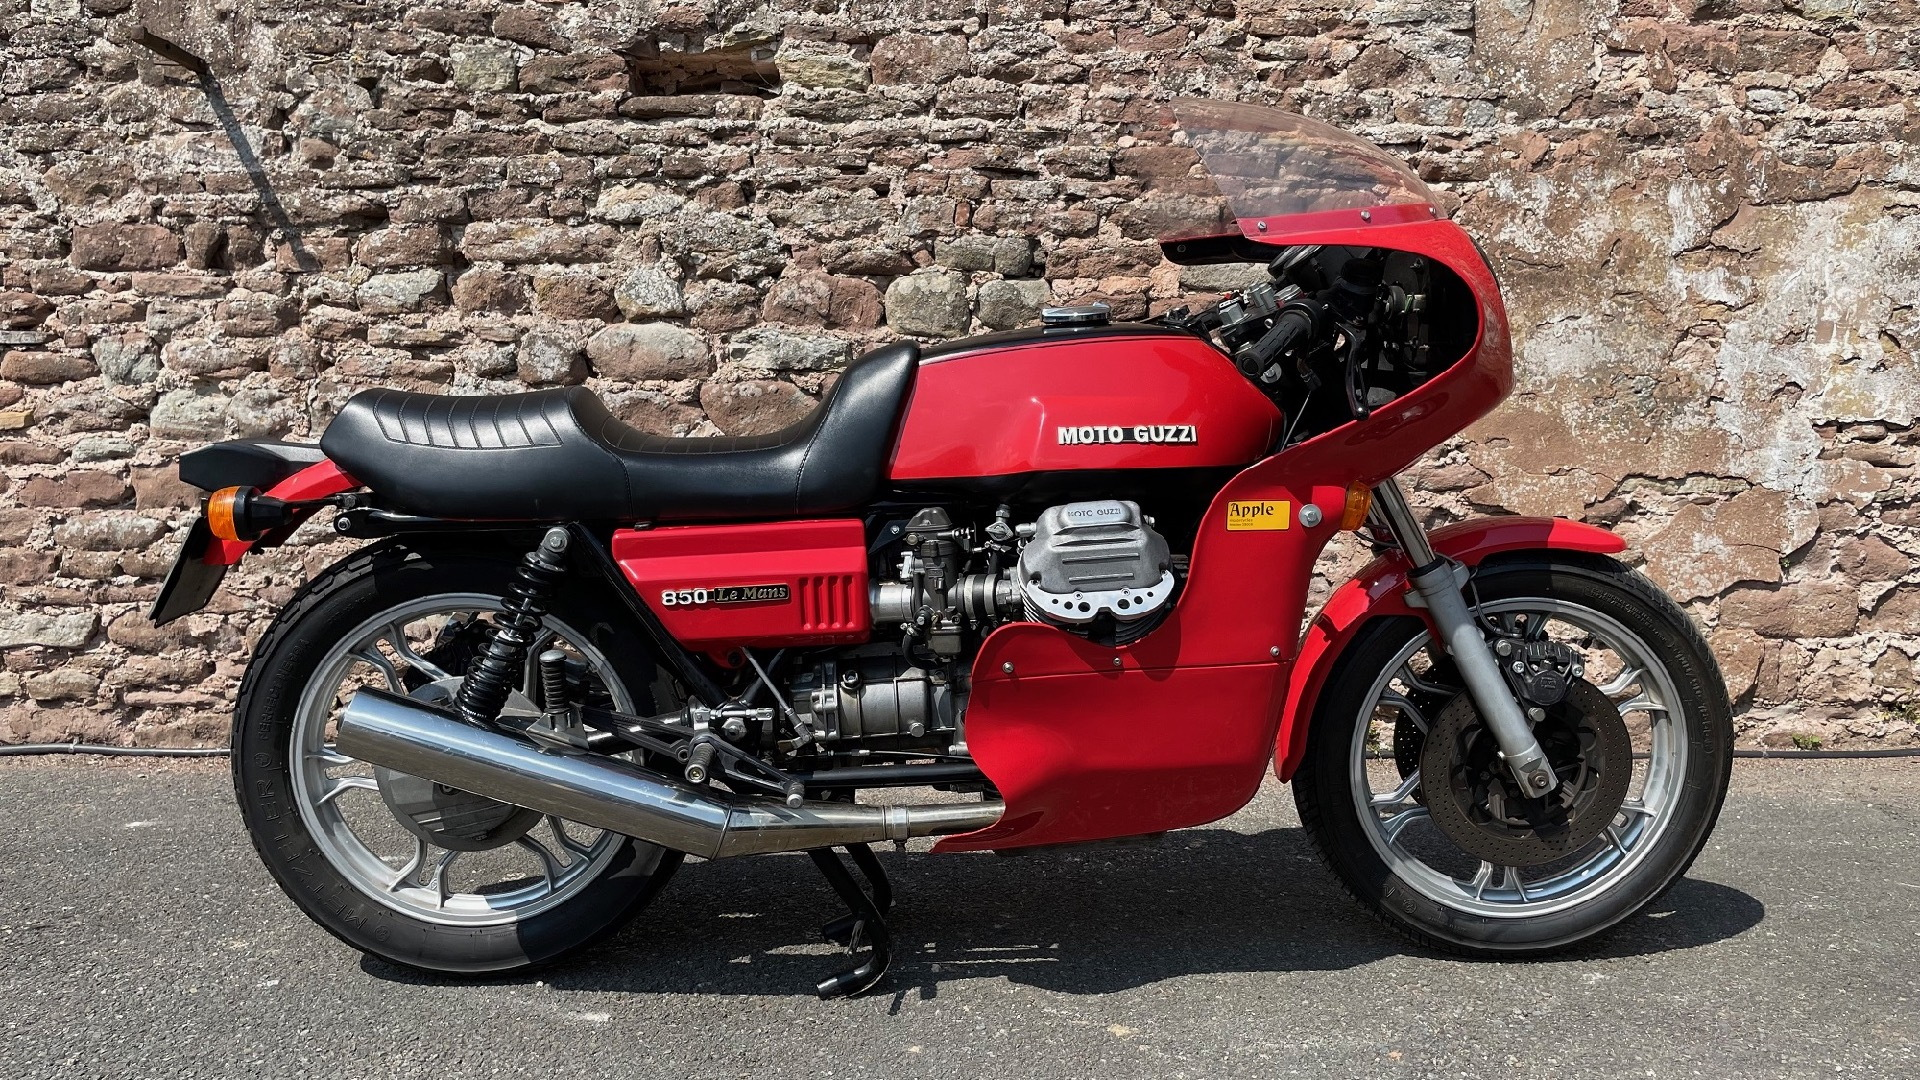 1977 Moto Guzzi Le Mans Mk1 owned by Richard Hammond (photo via Silverstone Auctions)